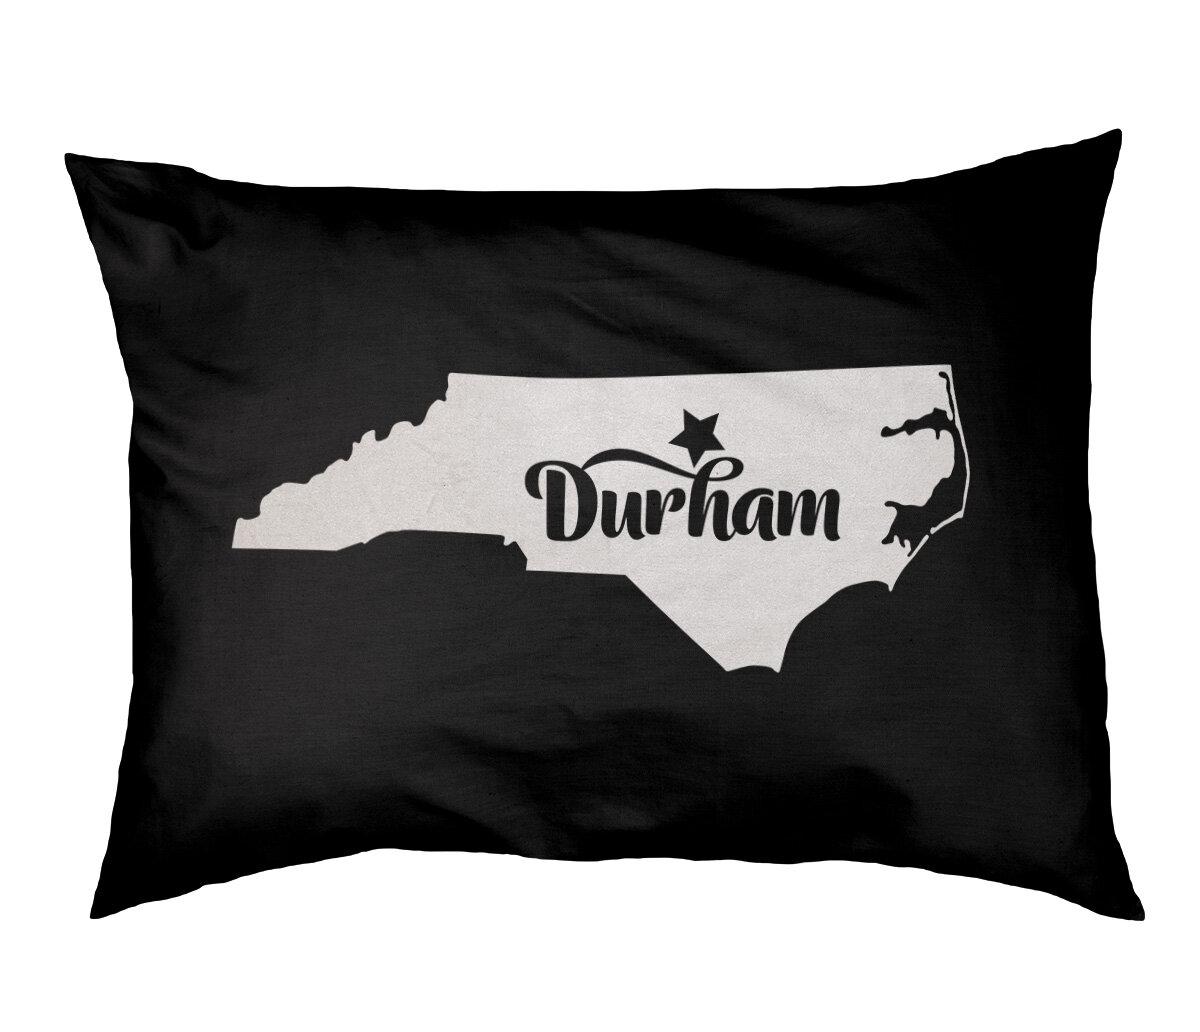 East Urban Home Durham North Carolina Designer Pillow Wayfair